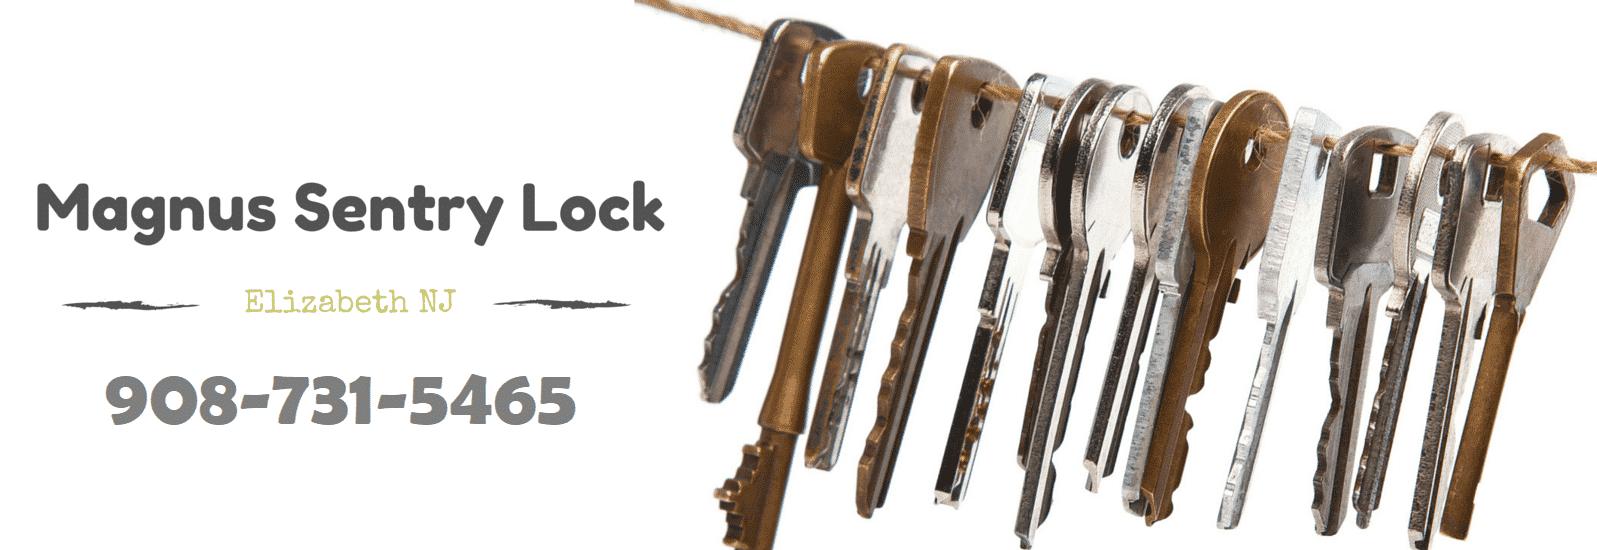 Magnus Sentry Lock your Locksmith in Elizabeth NJ